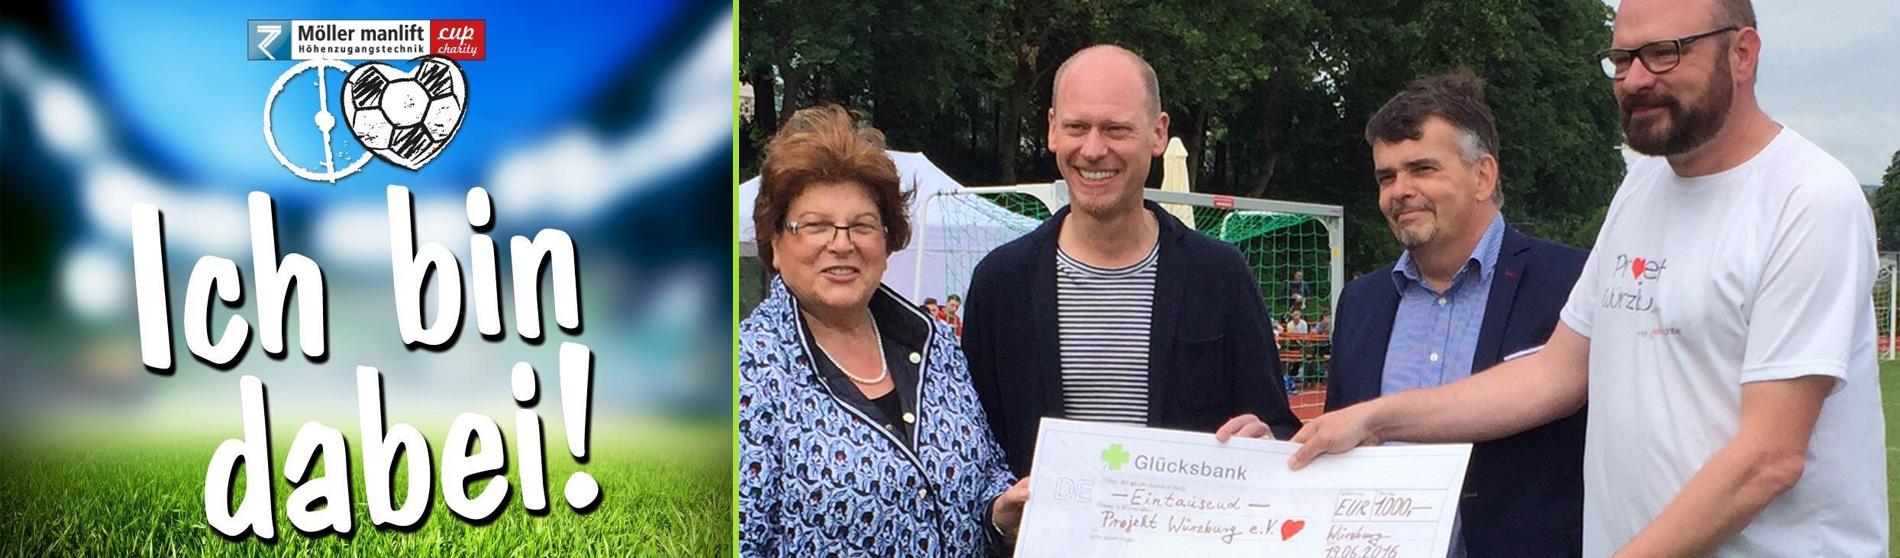 Charity Cup 2016 OHRpheus lite Sliderbild